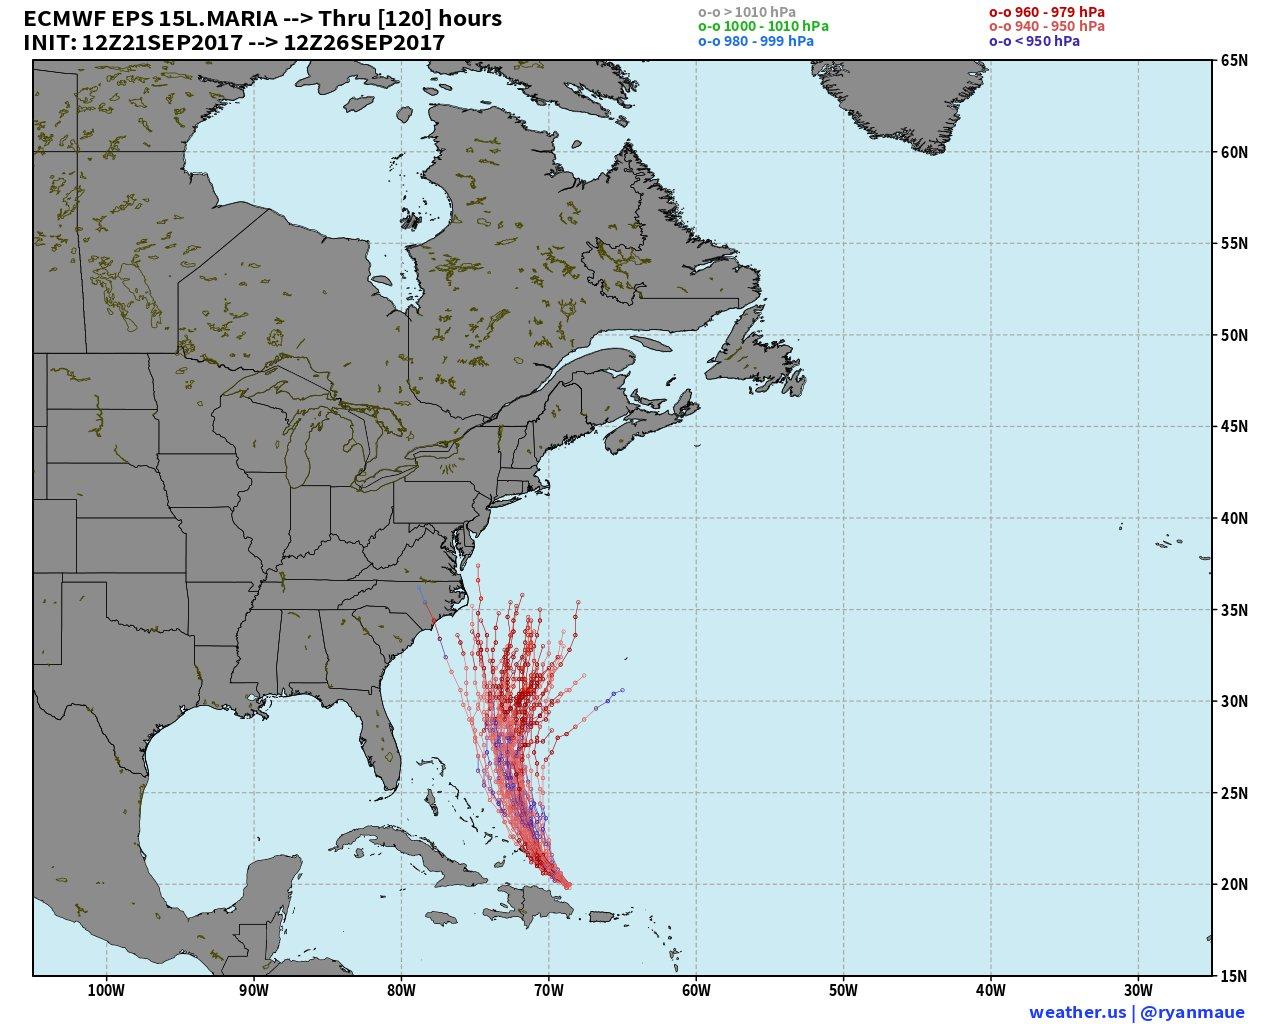 Latest European ensemble model runs only shows a few tracks towards the Mid-Atlantic